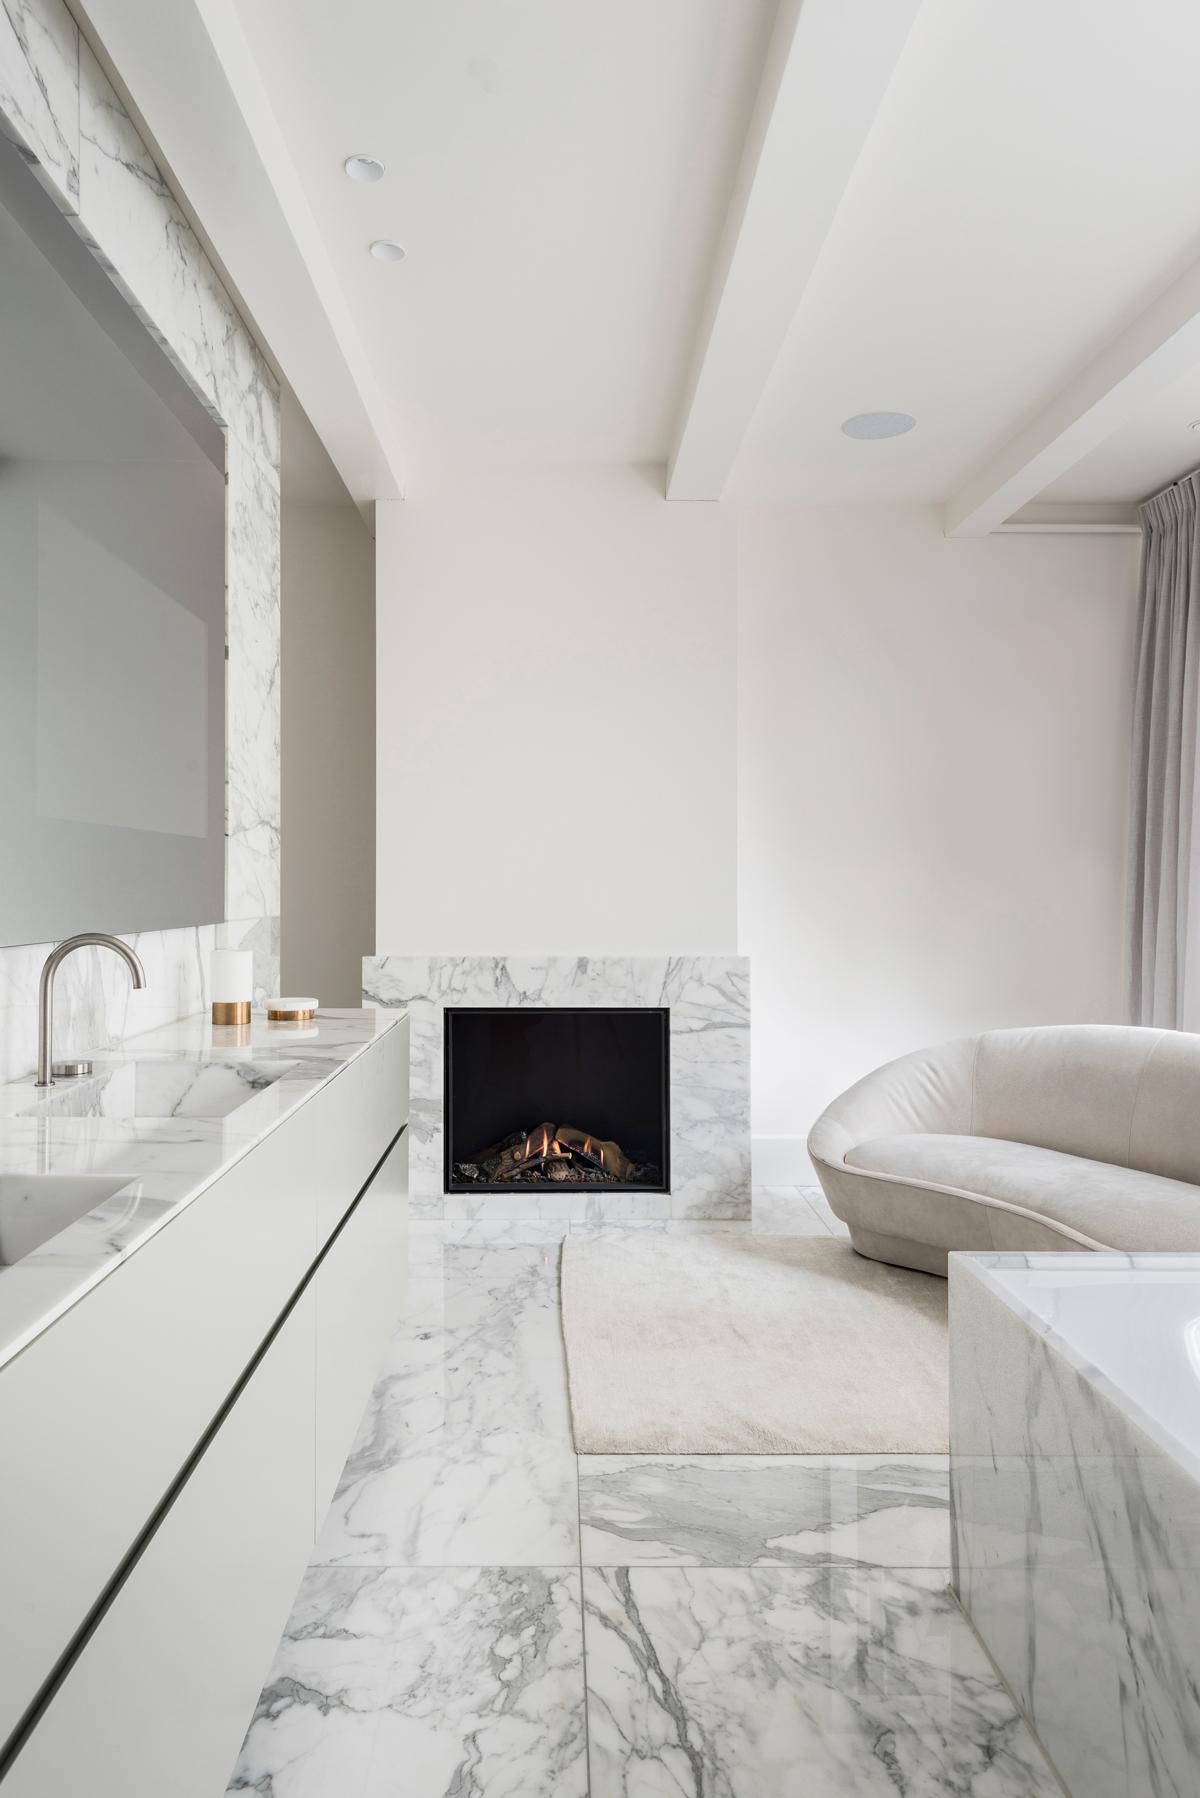 stone natural class, mamer, minimalistisch interieur